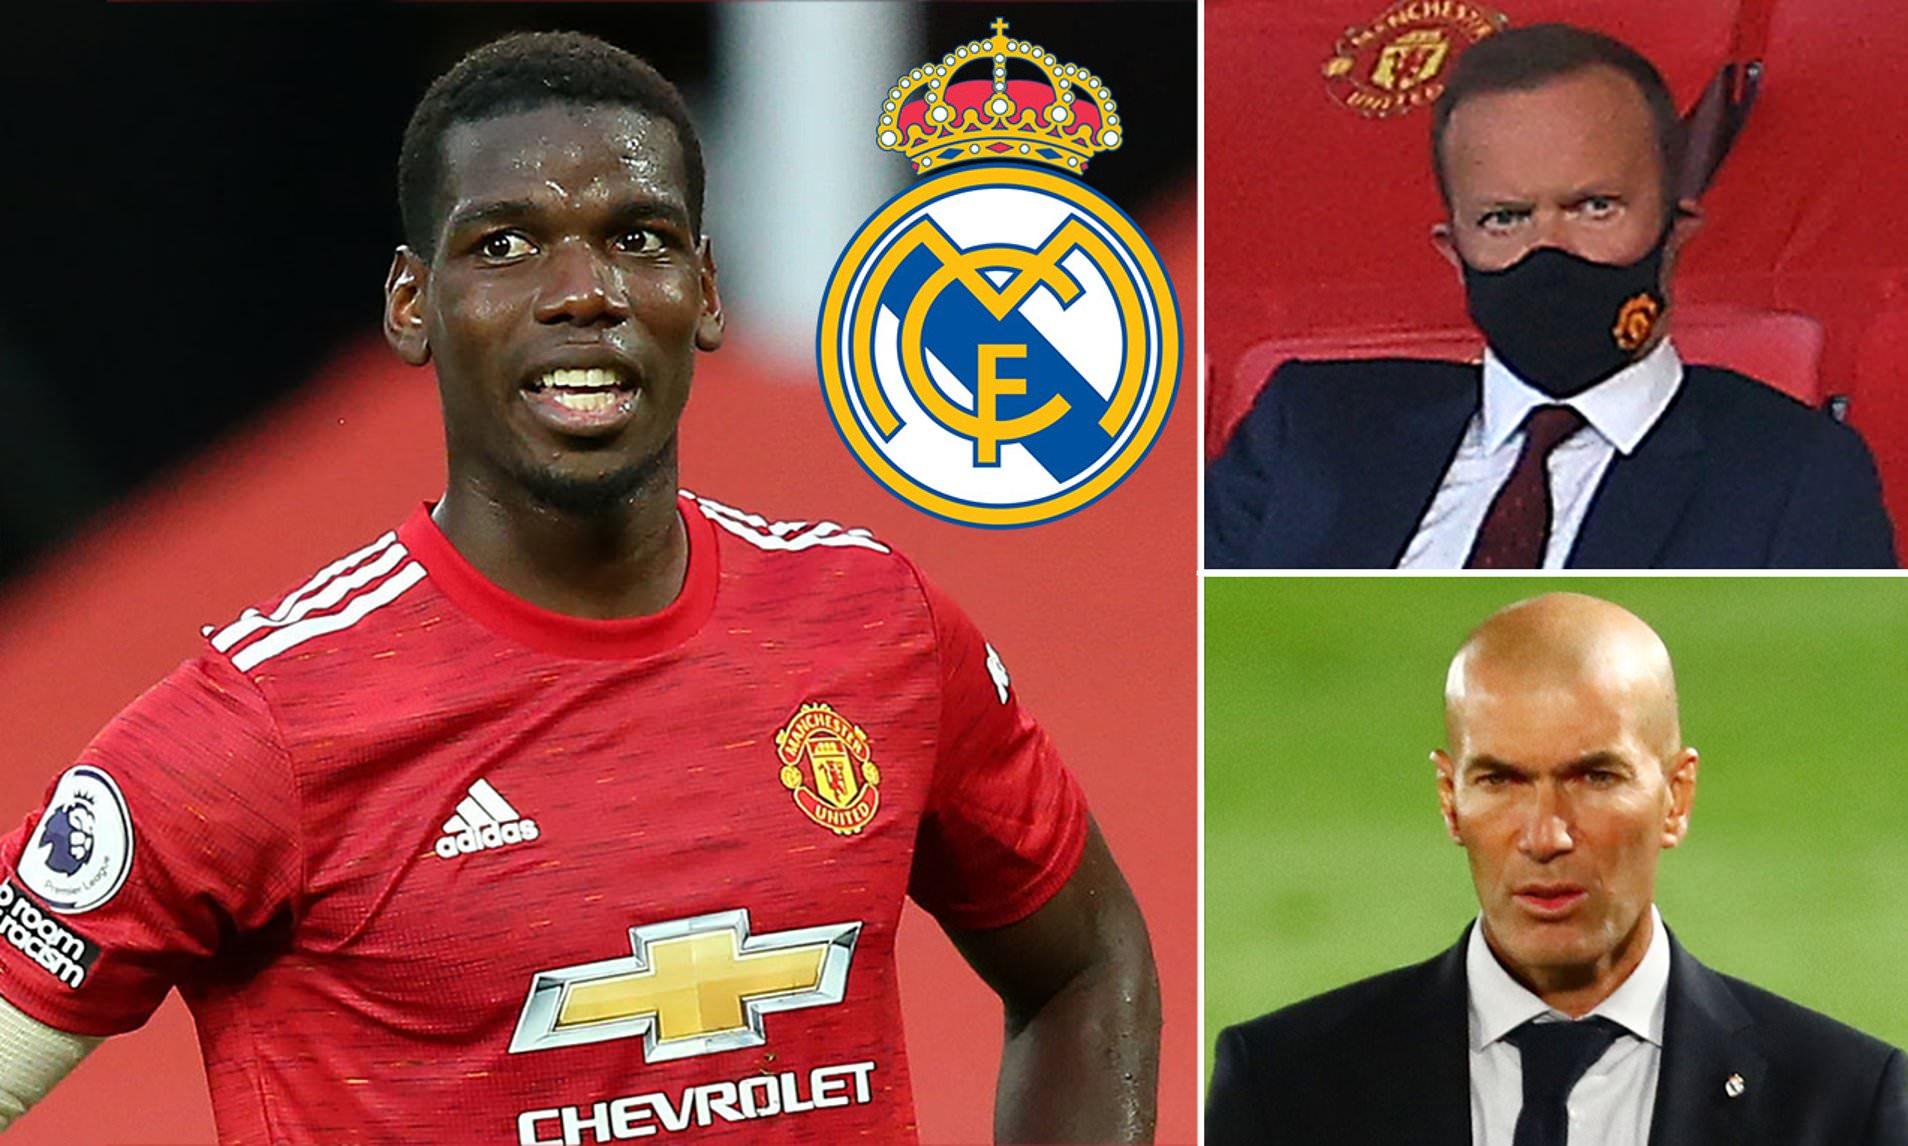 Погба си призна: Сон ми е да играм за Реал Мадрид